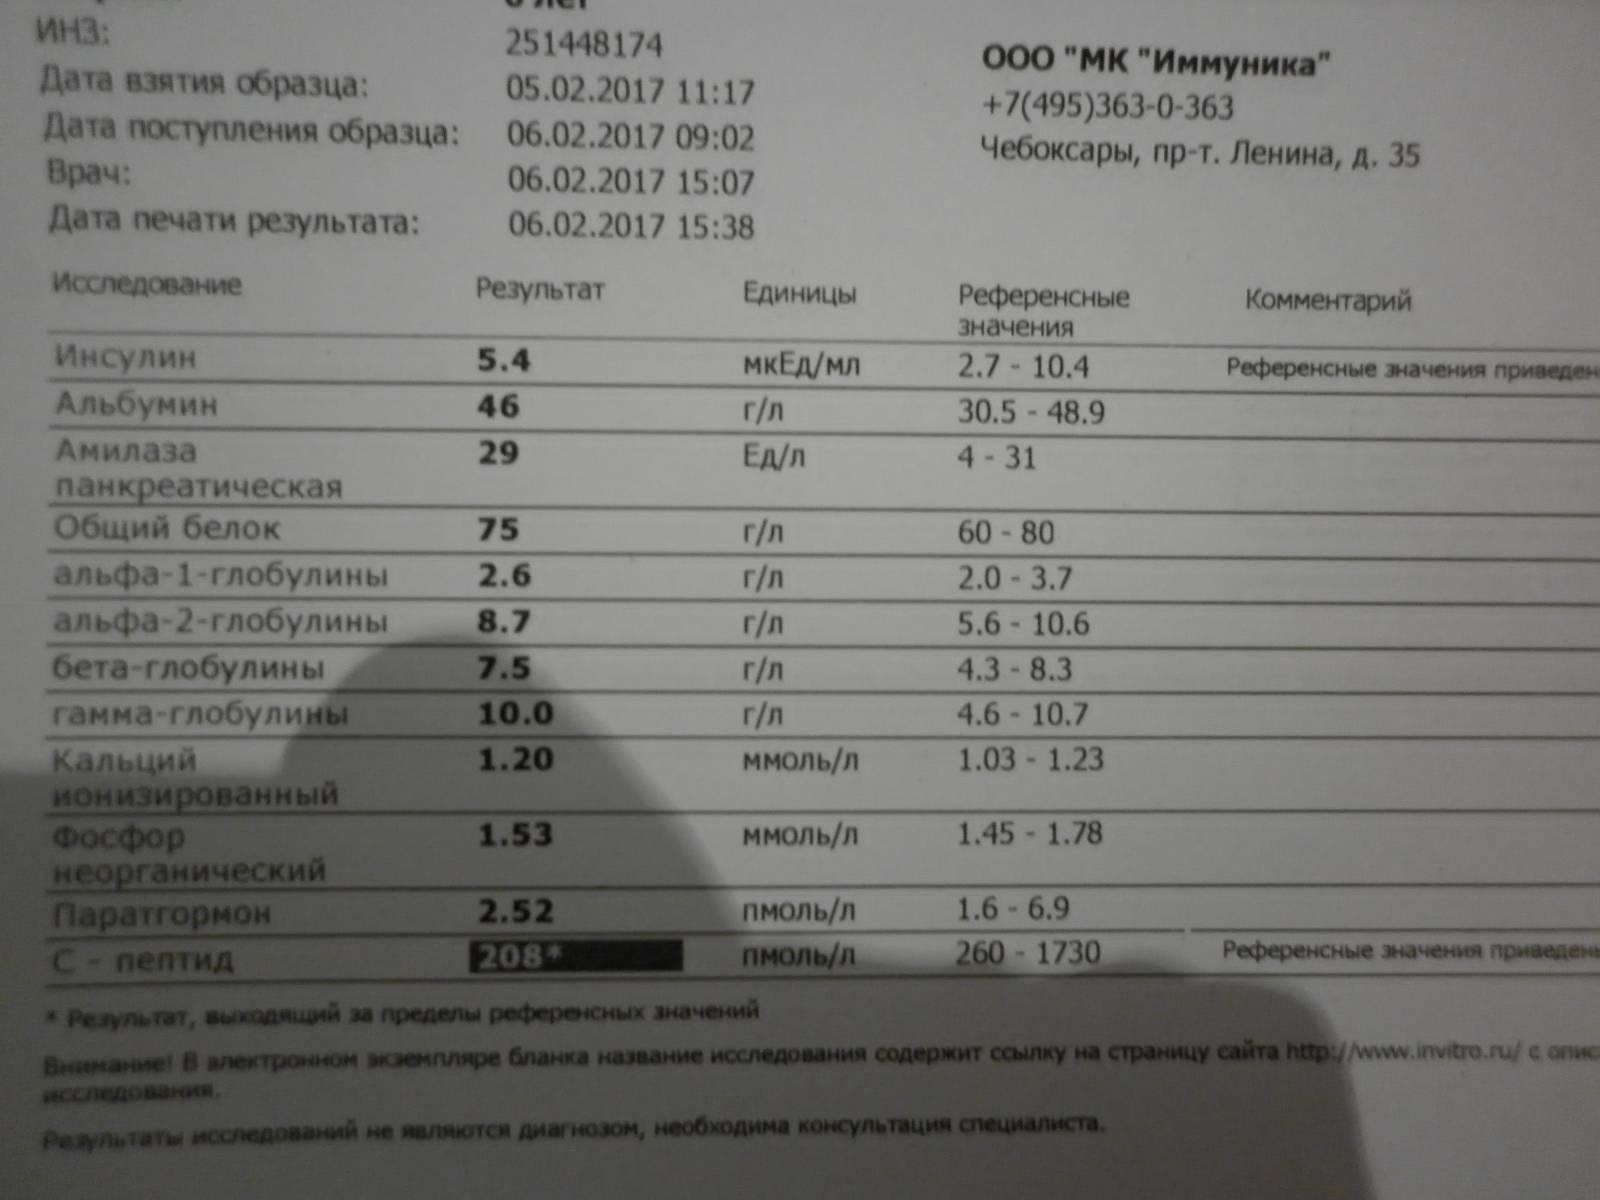 Ярослав и мама Люба - Страница 23 B1a0b6e63c41c5614f06bbd606c7e273b079ad269158101